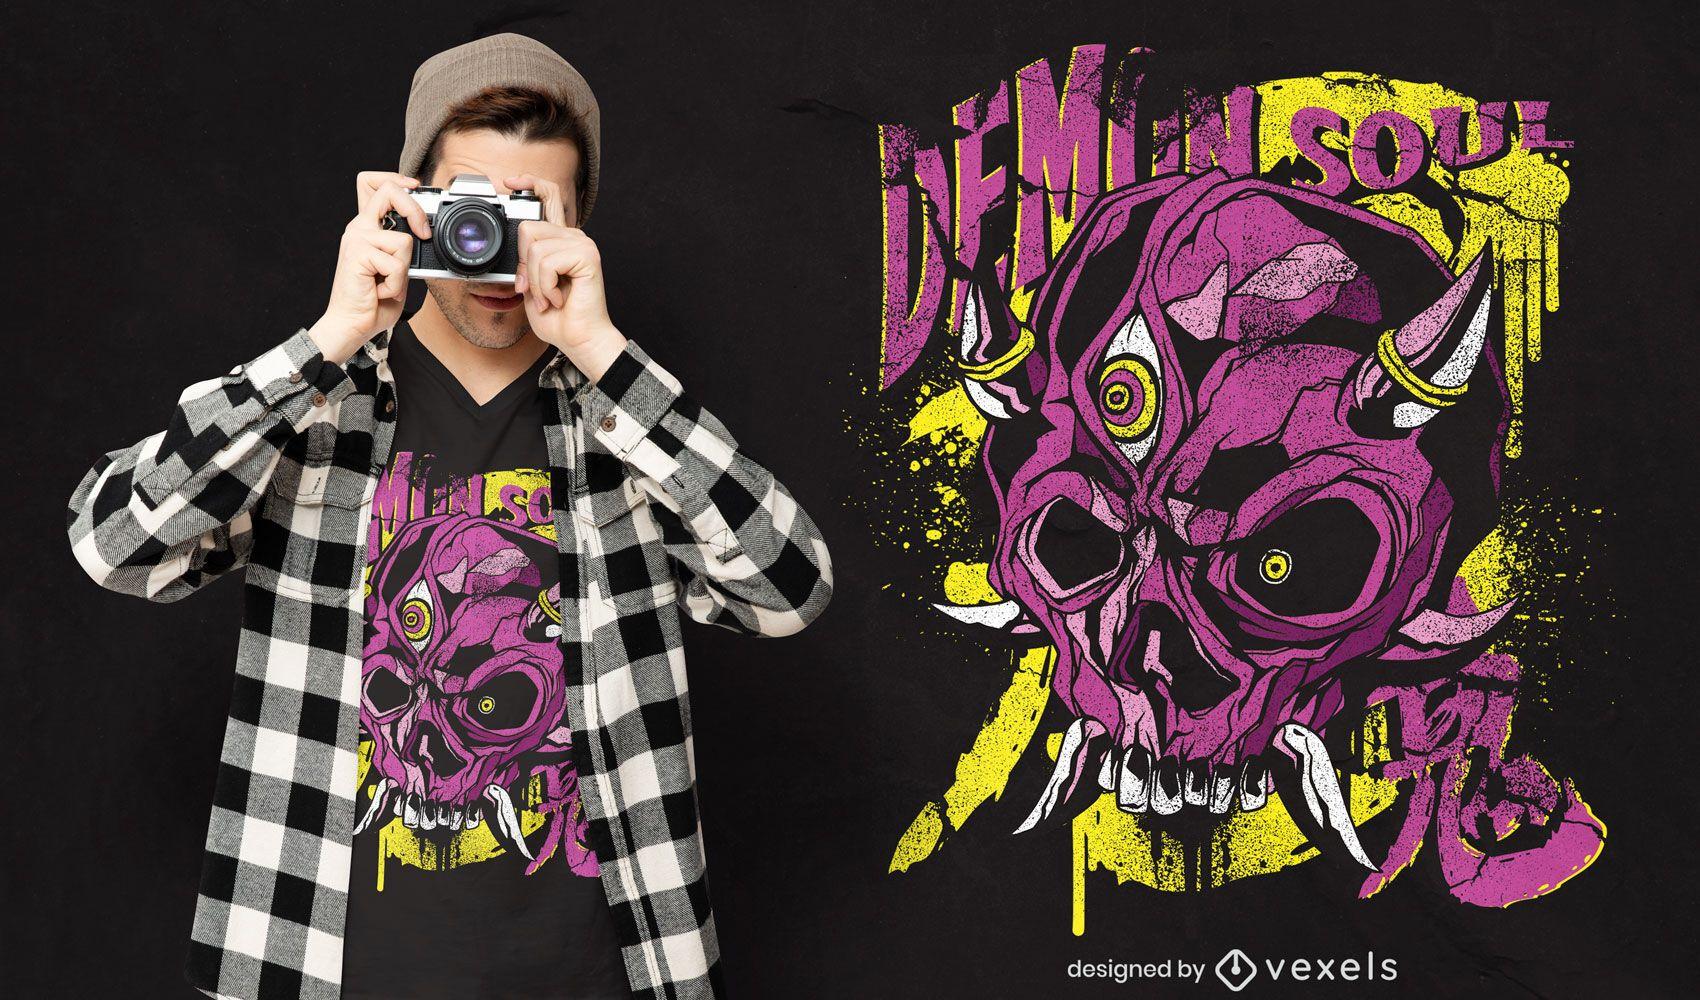 Demon skull creepy t-shirt design